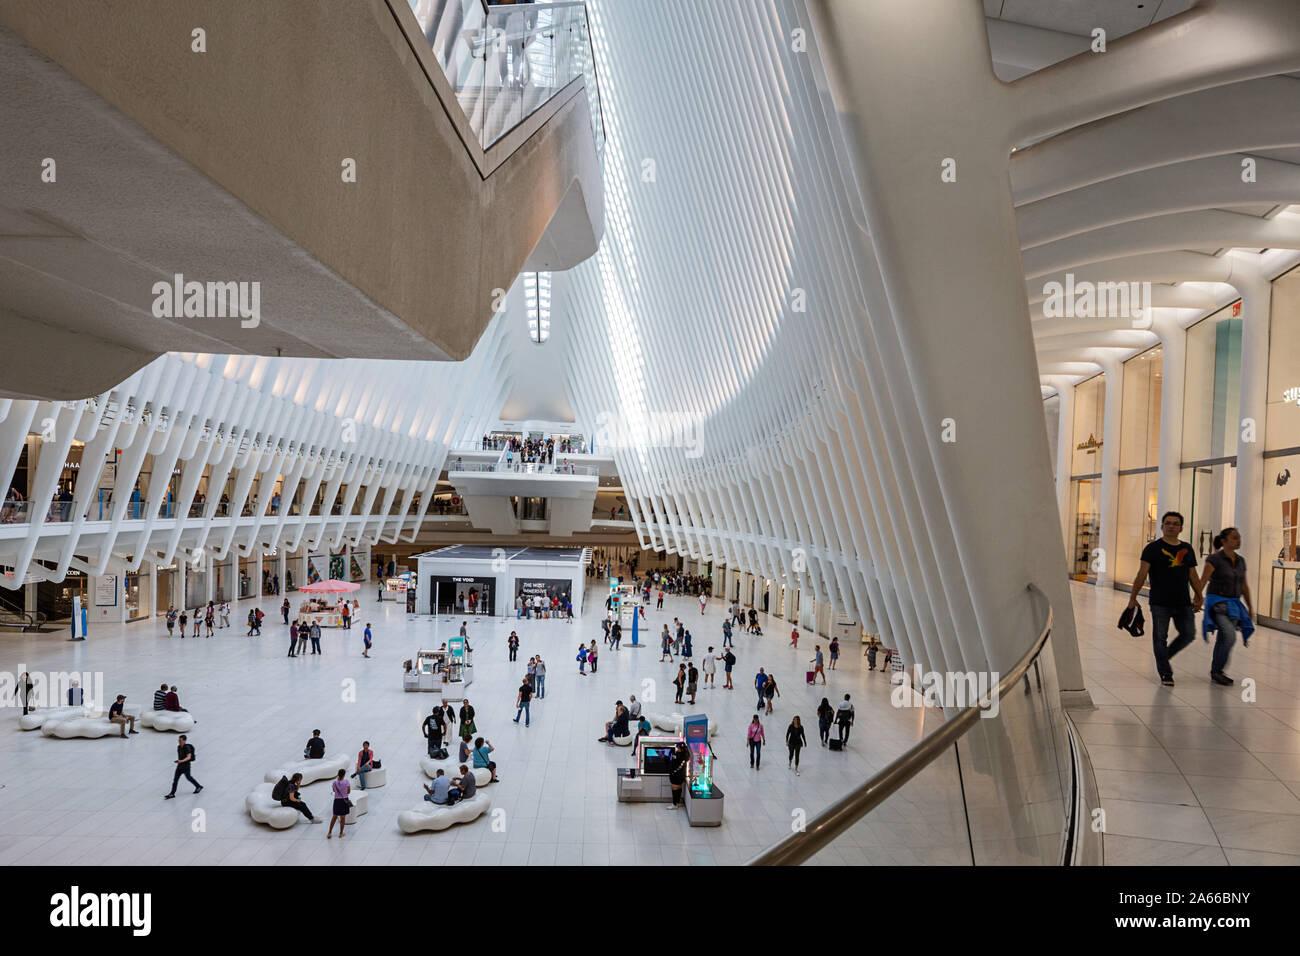 The Oculus, New York City Transportation Hub at the  World Trade Center site, Ground Zero. Stock Photo